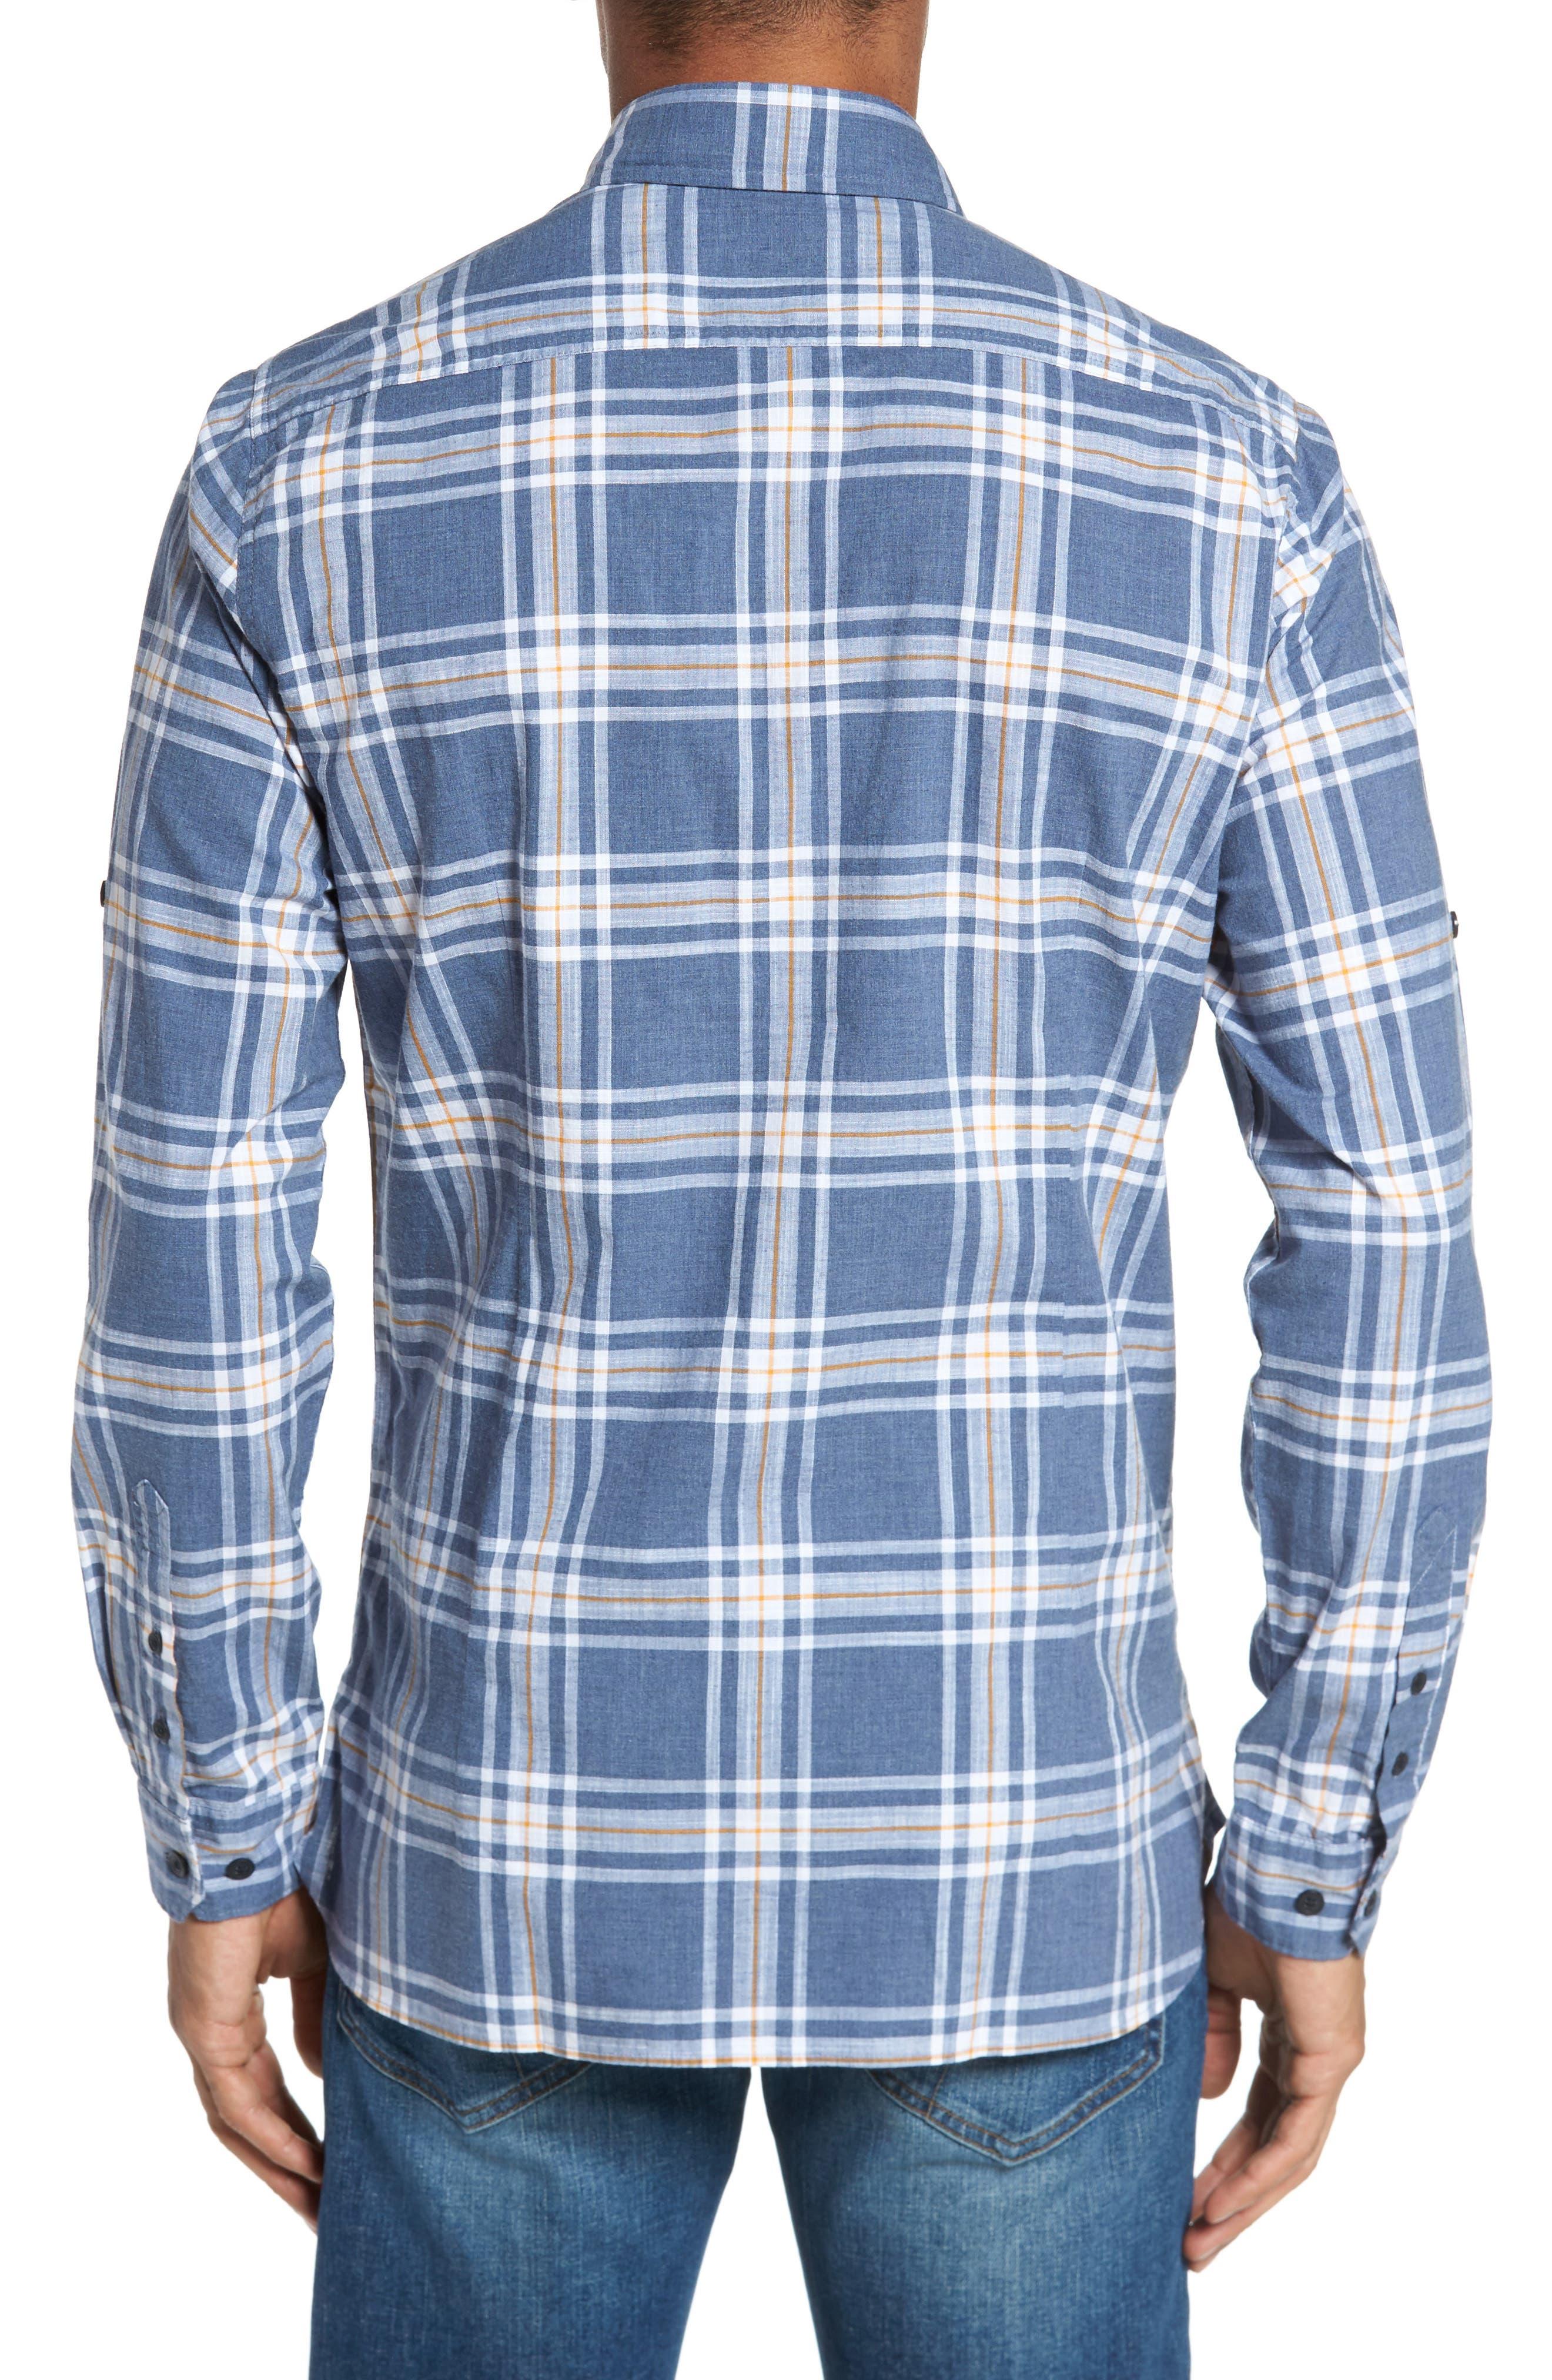 Elver Tailored Fit Plaid Sport Shirt,                             Alternate thumbnail 2, color,                             410